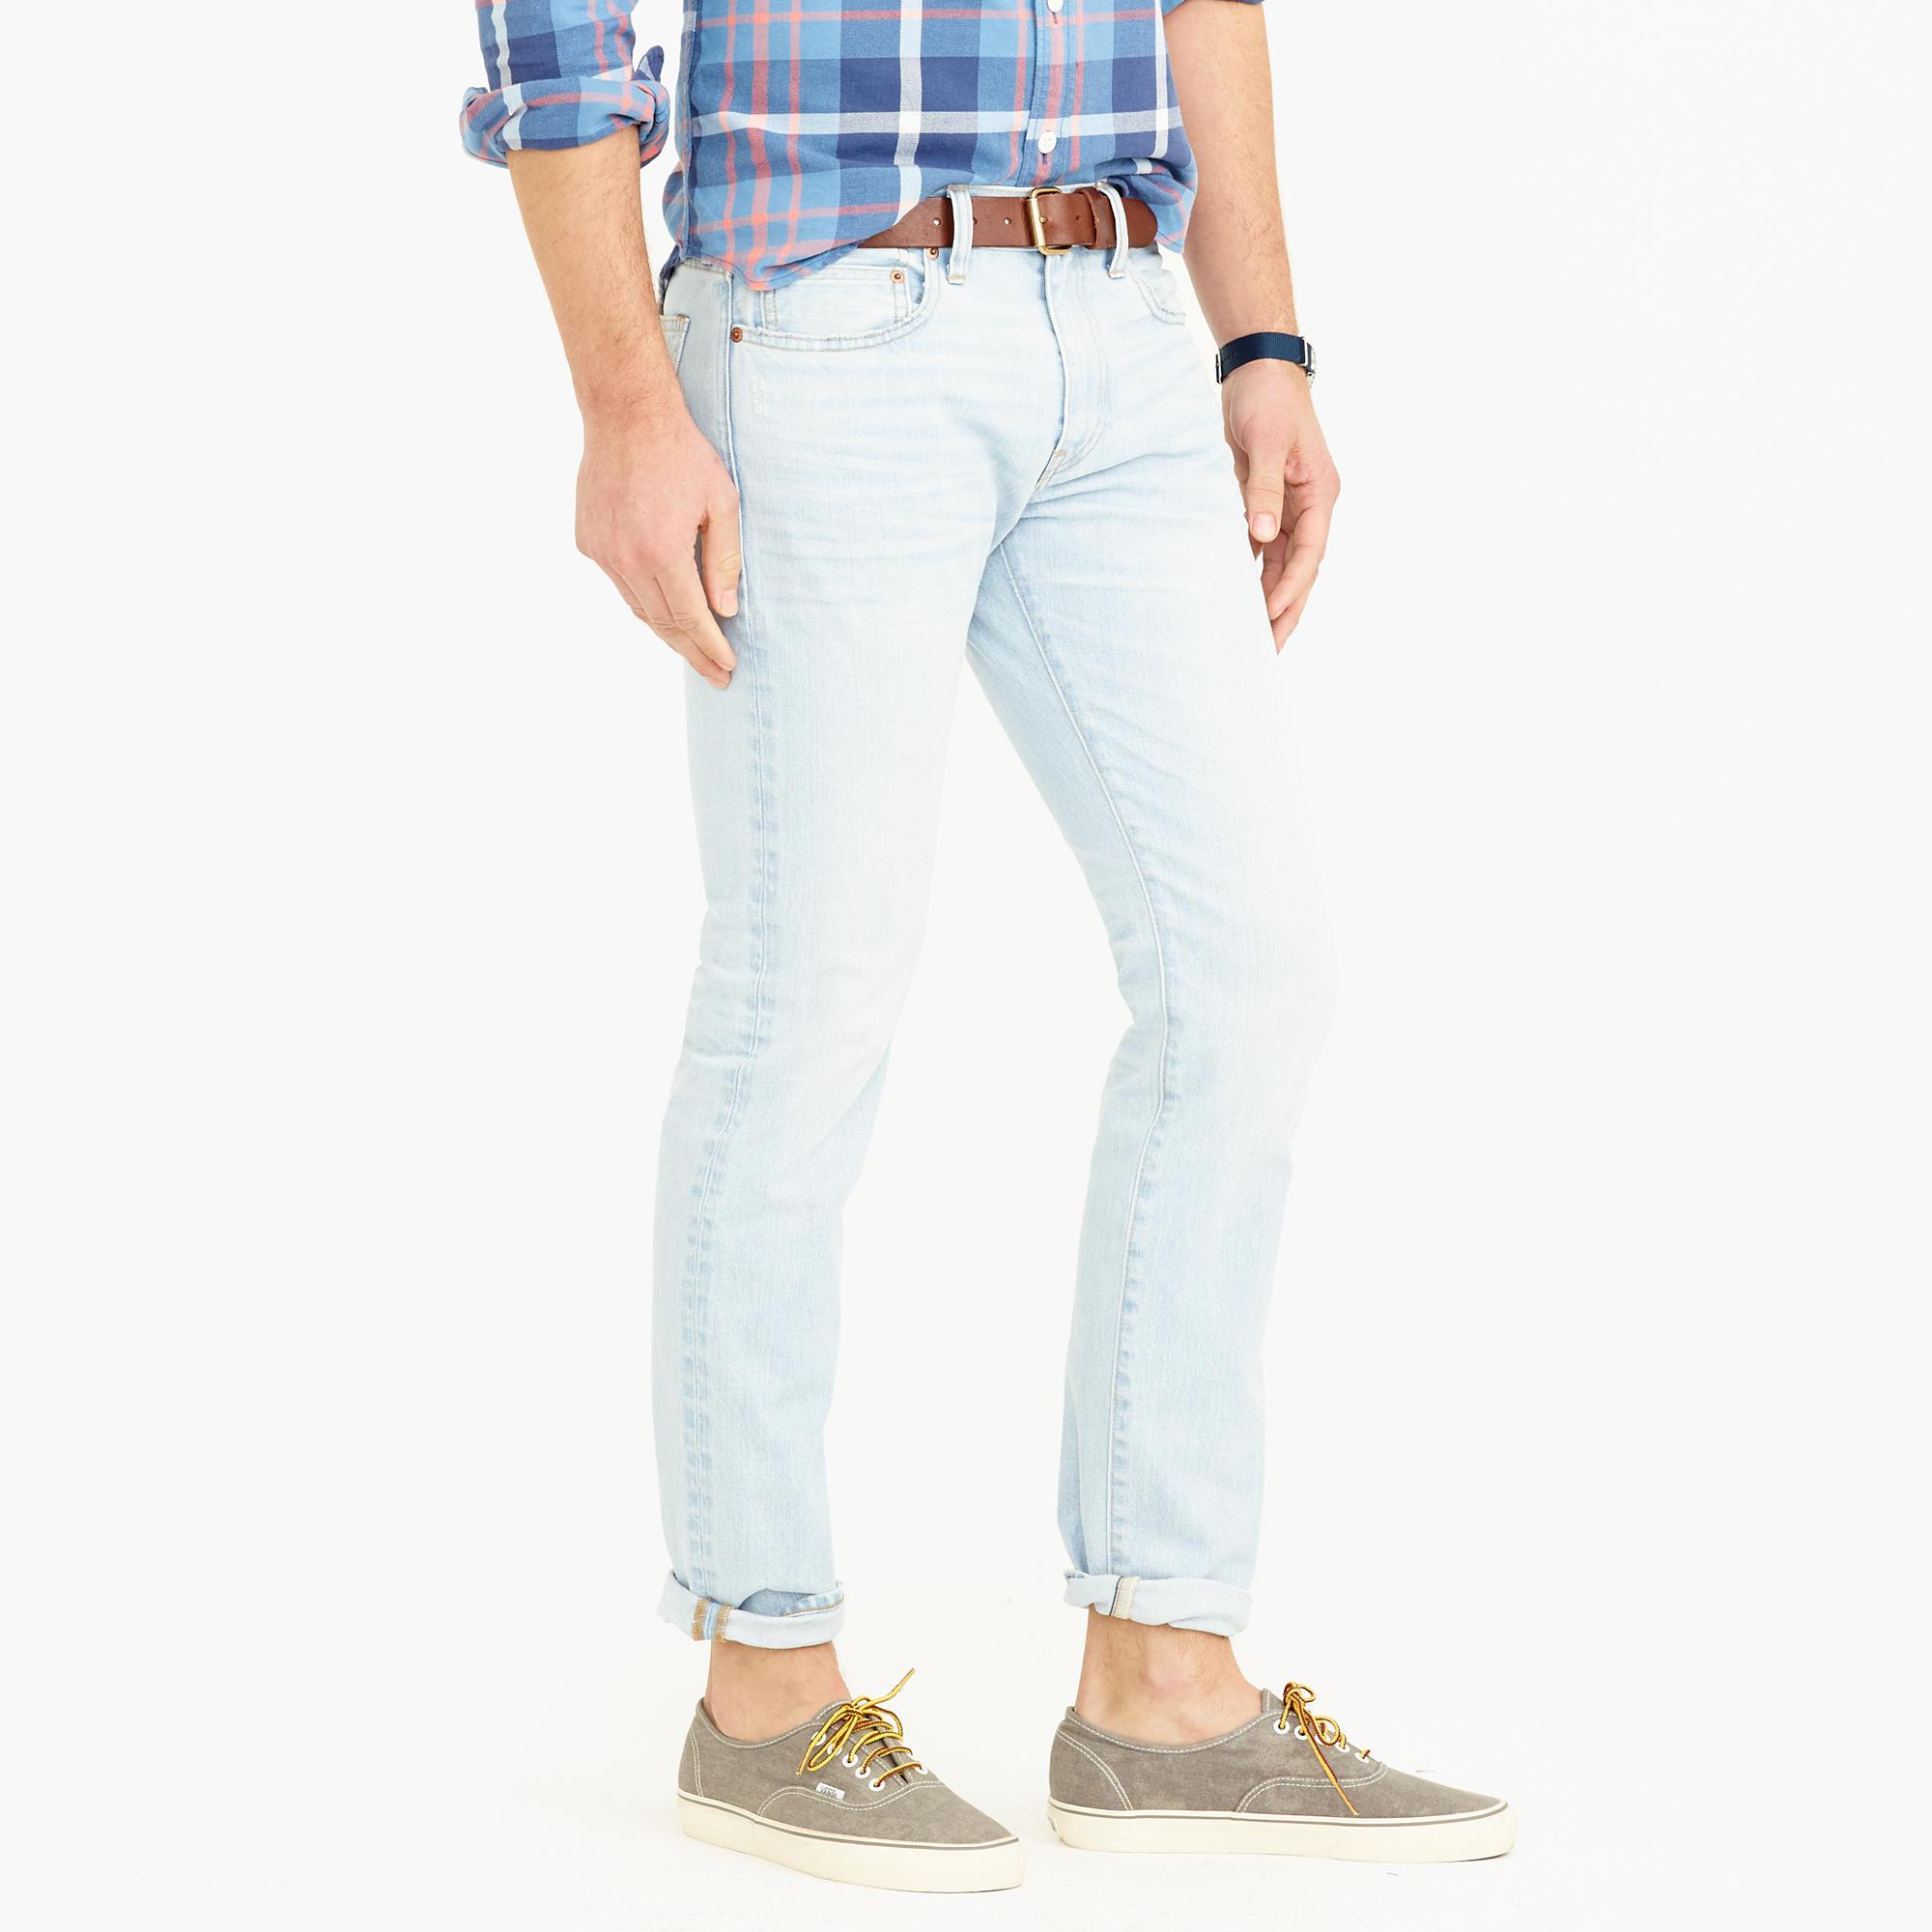 J.Crew Denim 484 Slim Jean In Winslow Wash in Blue for Men